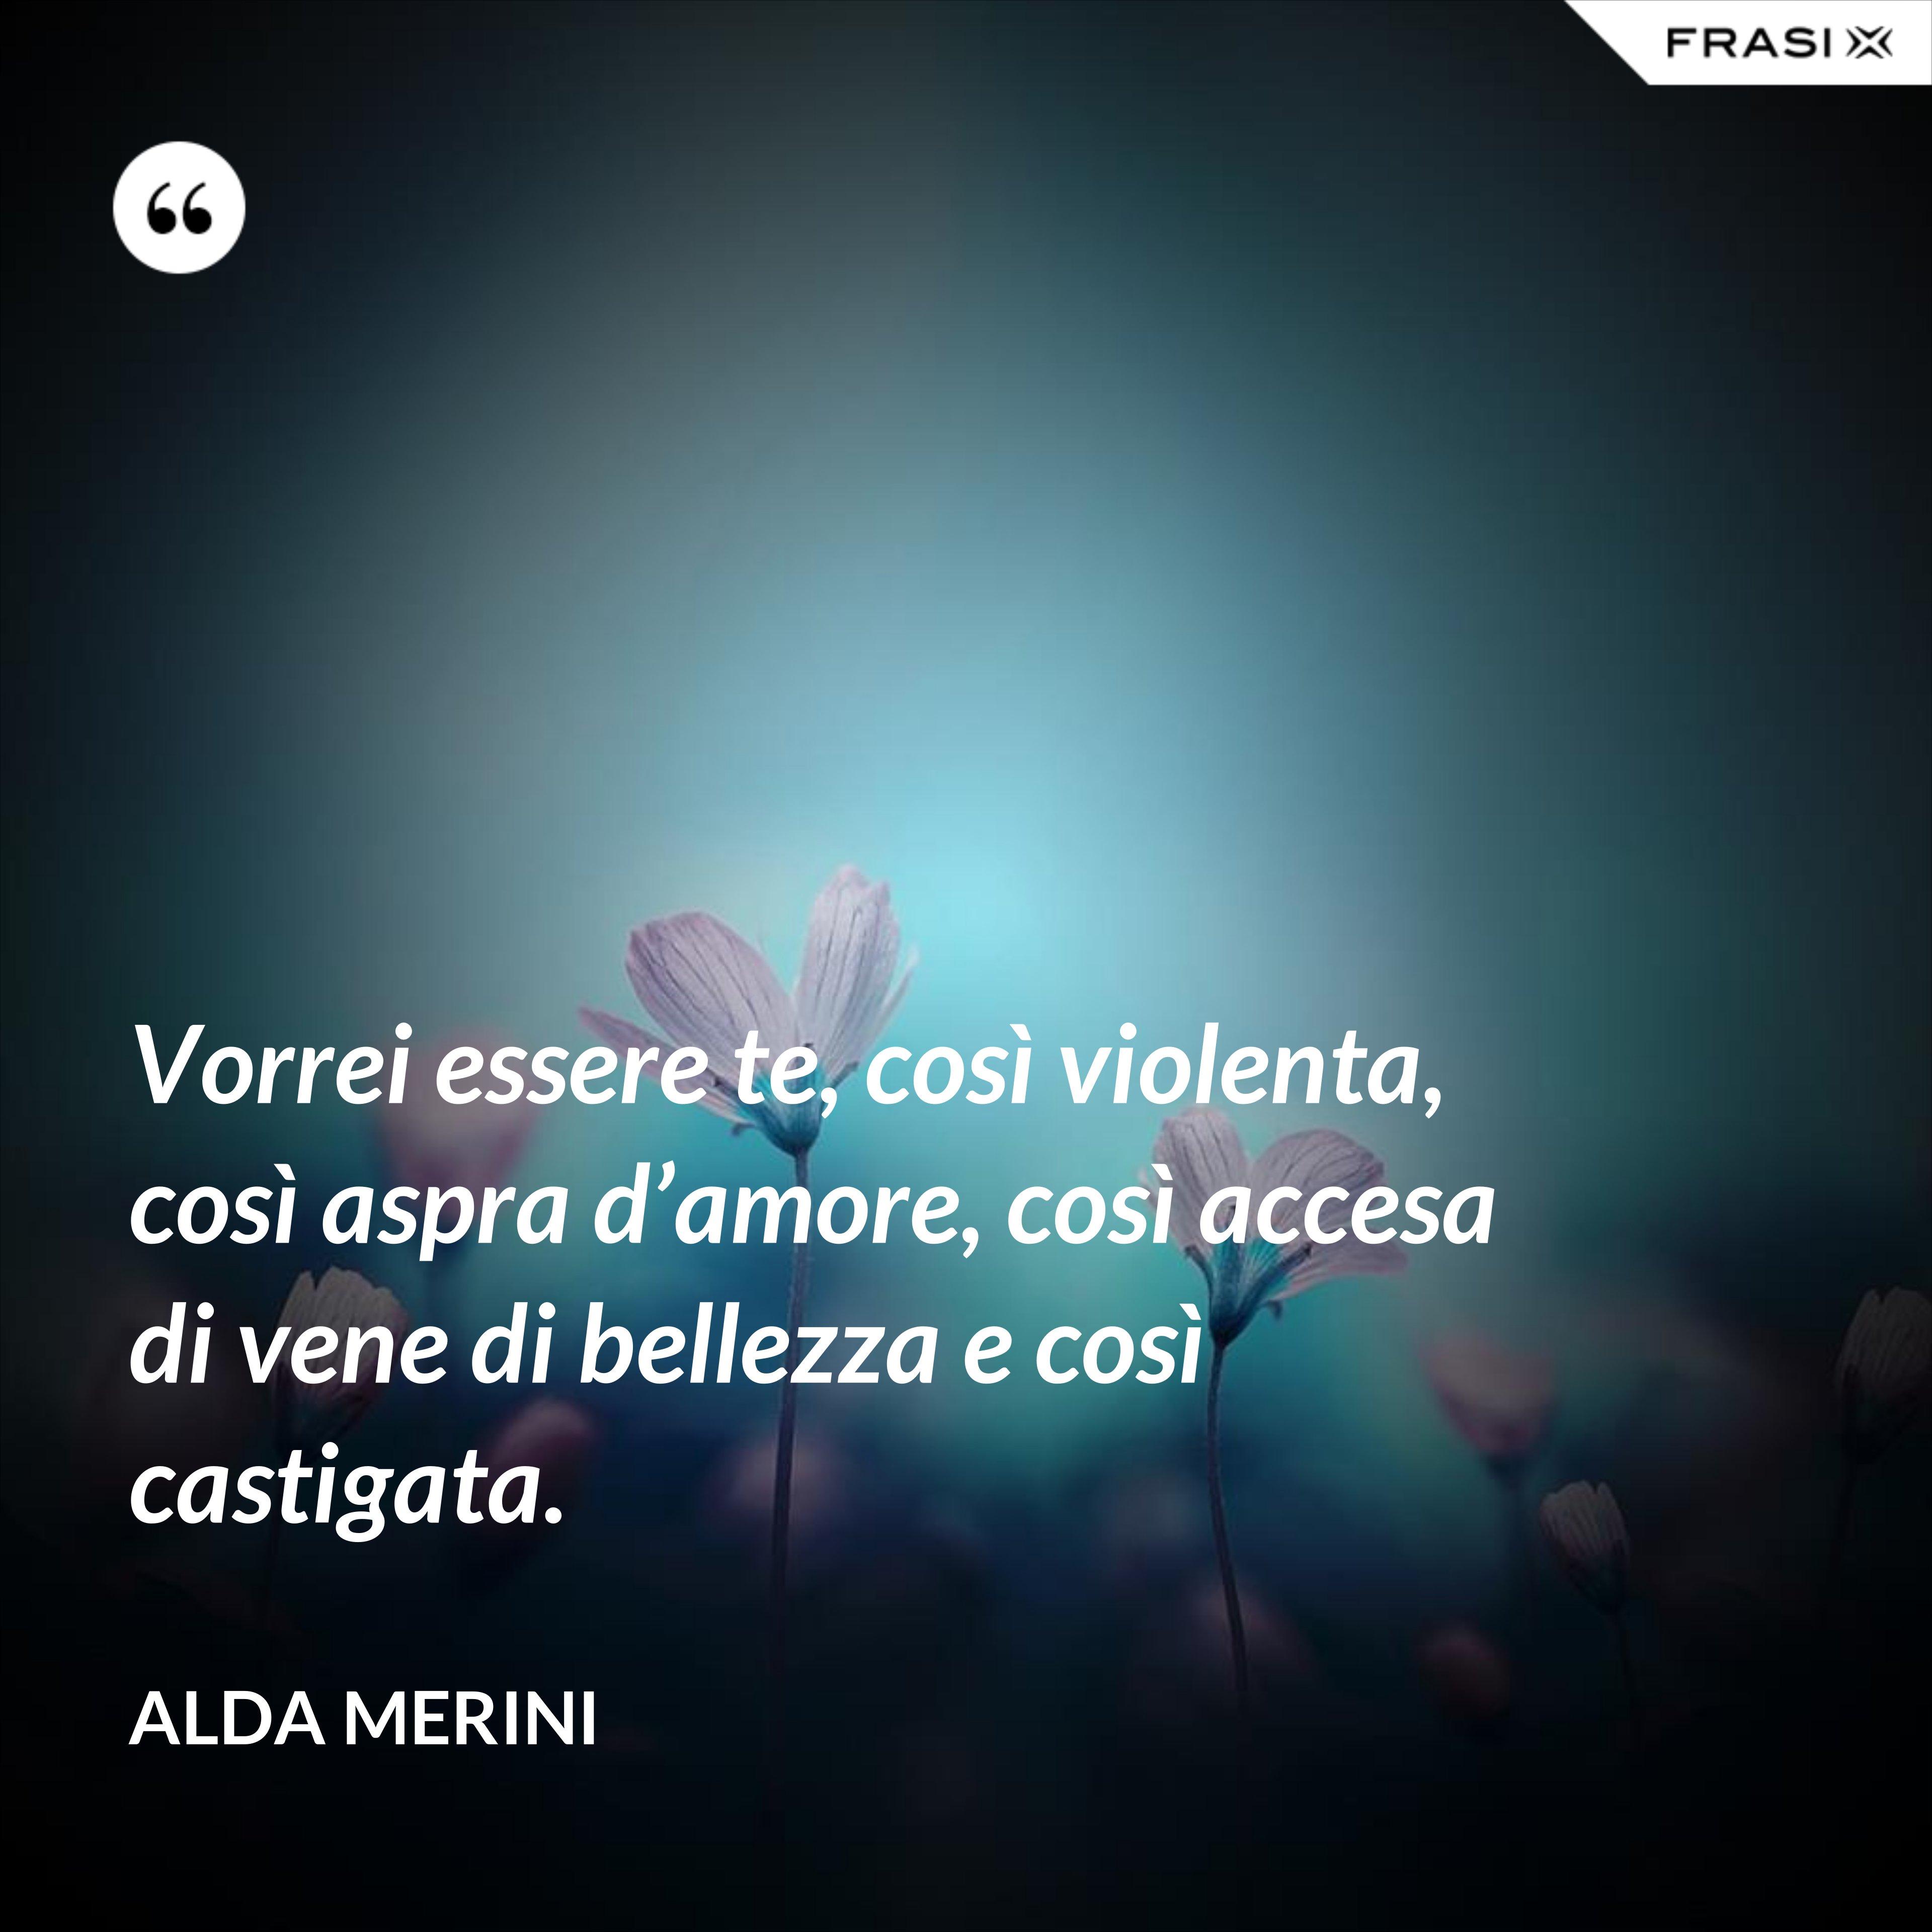 Vorrei essere te, così violenta, così aspra d'amore, così accesa di vene di bellezza e così castigata. - Alda Merini